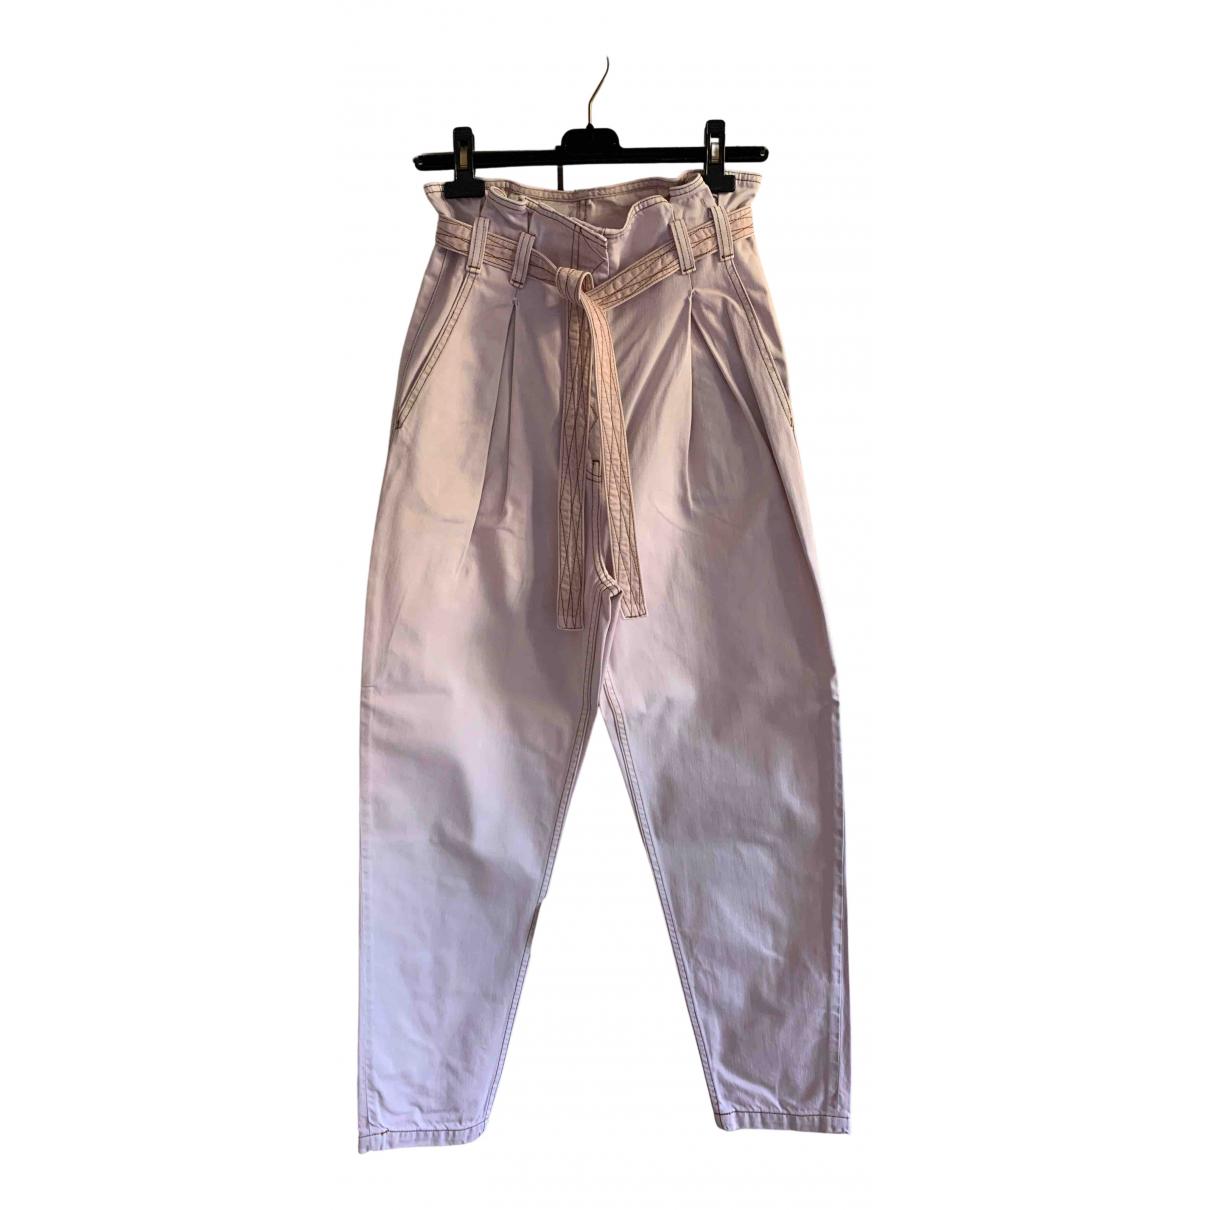 & Stories N Pink Denim - Jeans Jeans for Women 36 FR